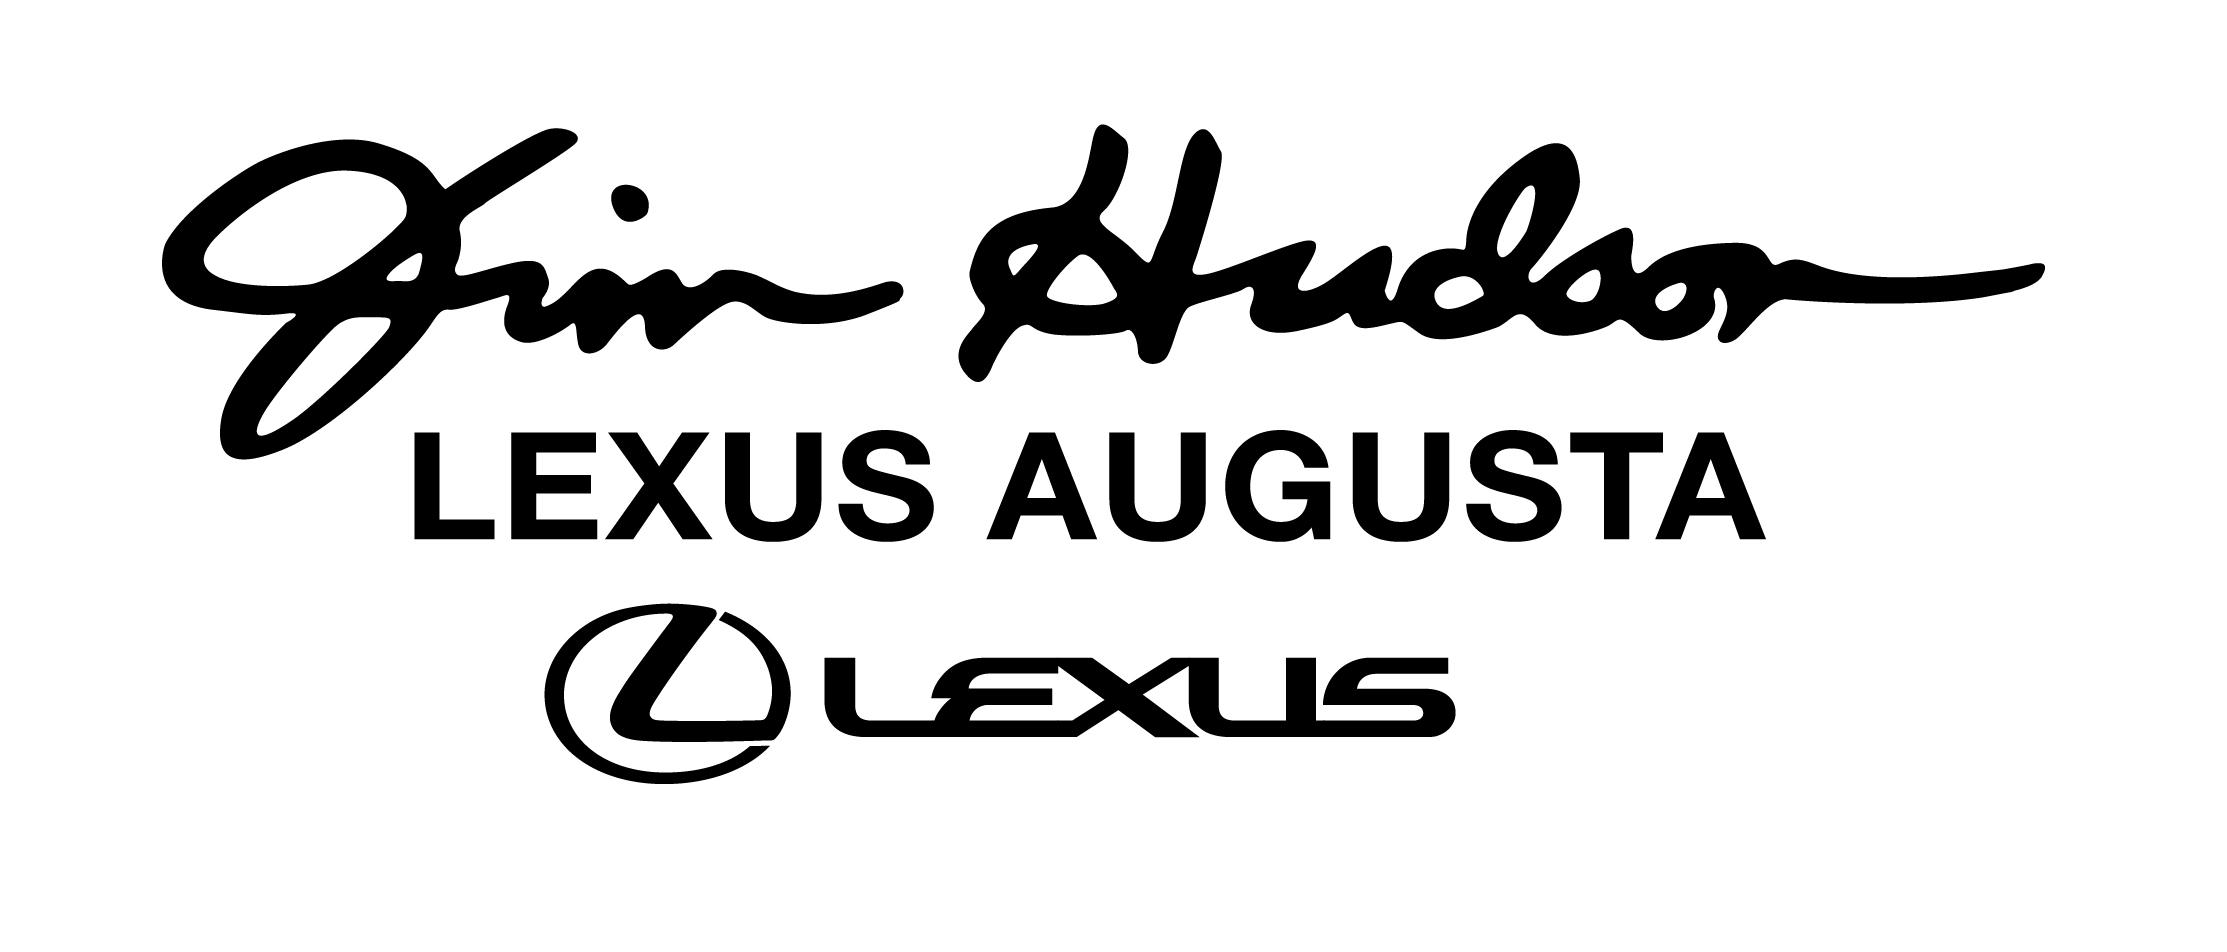 jim hudson lexus of augusta augusta ga yp